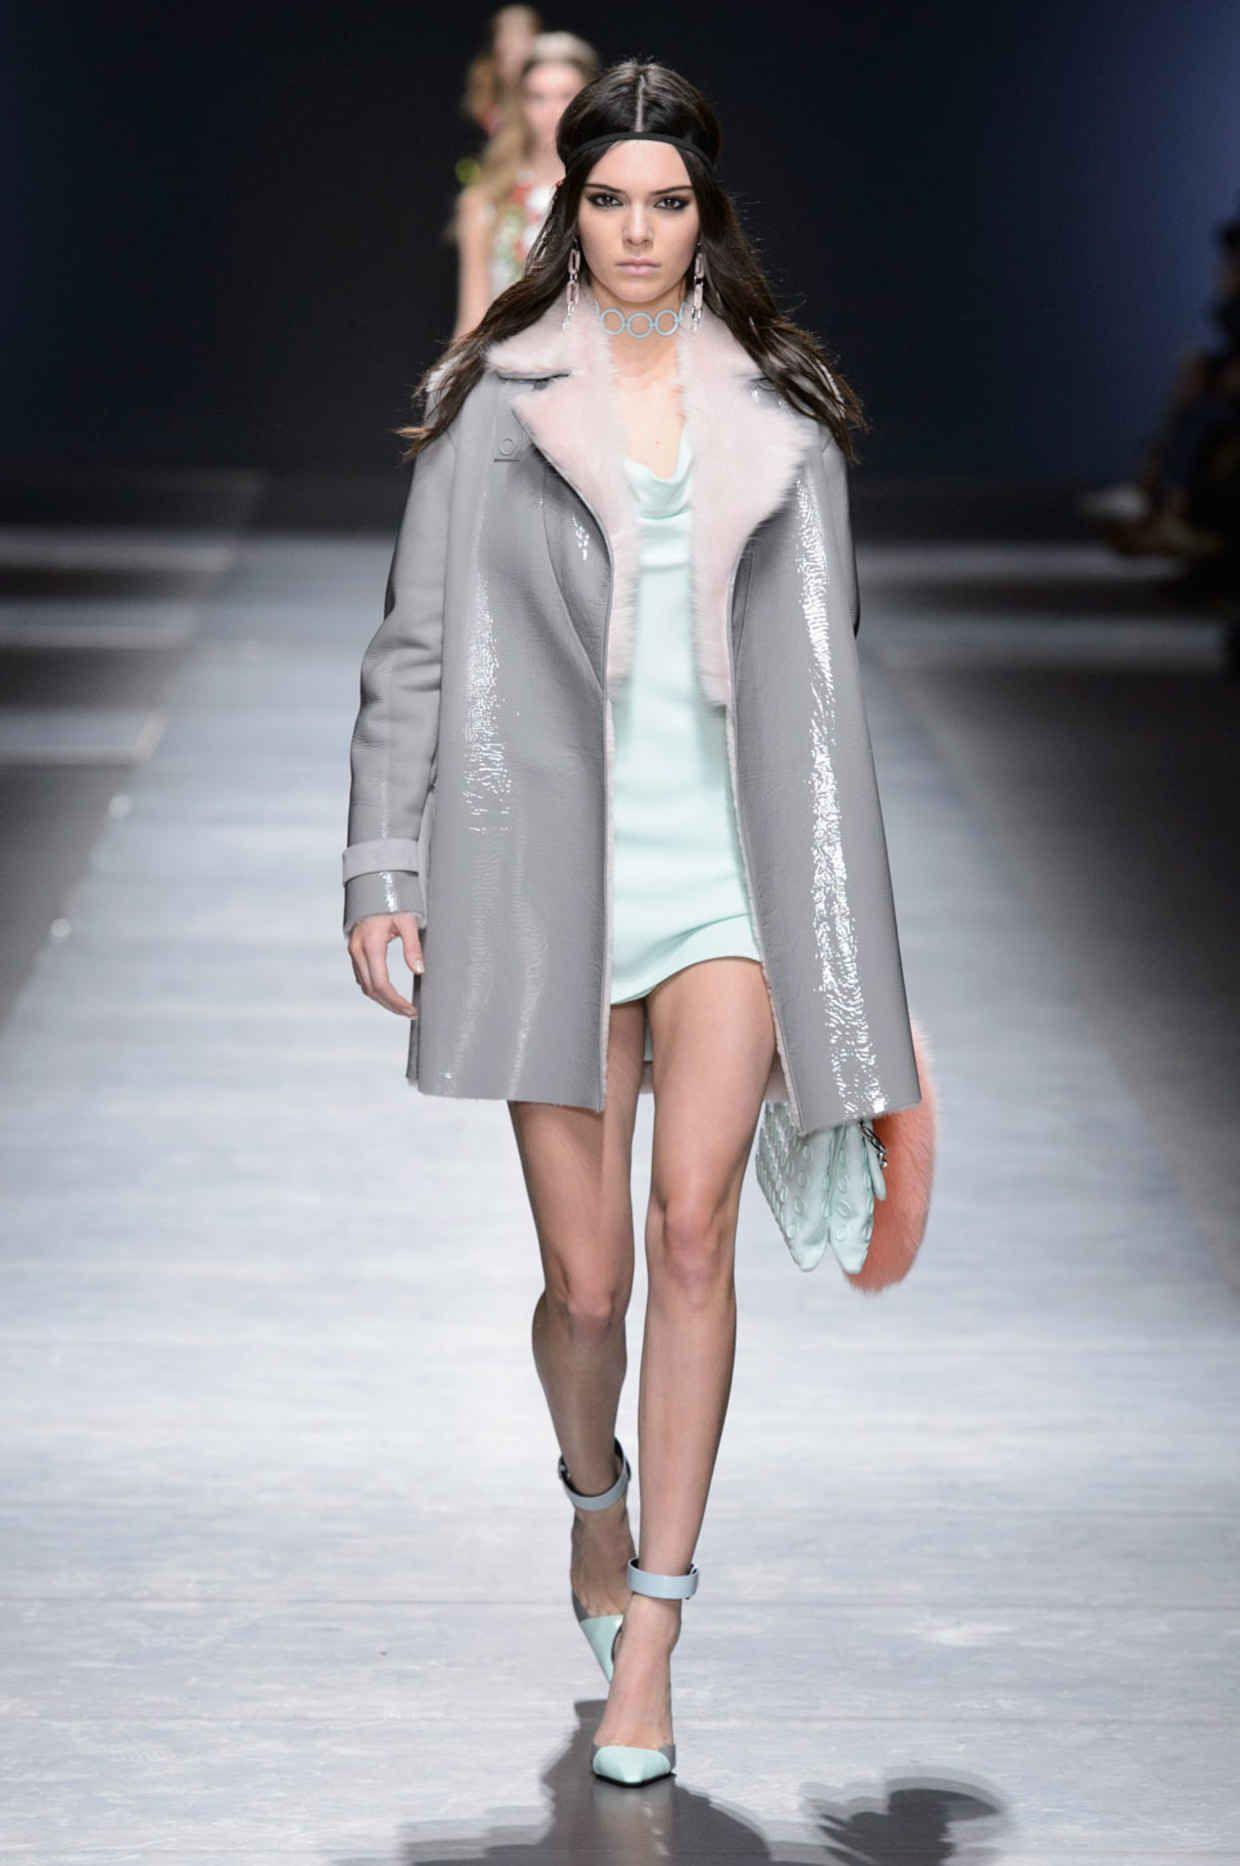 Versace MFW fw16-17 #KendellJenner Photo: Imaxtree